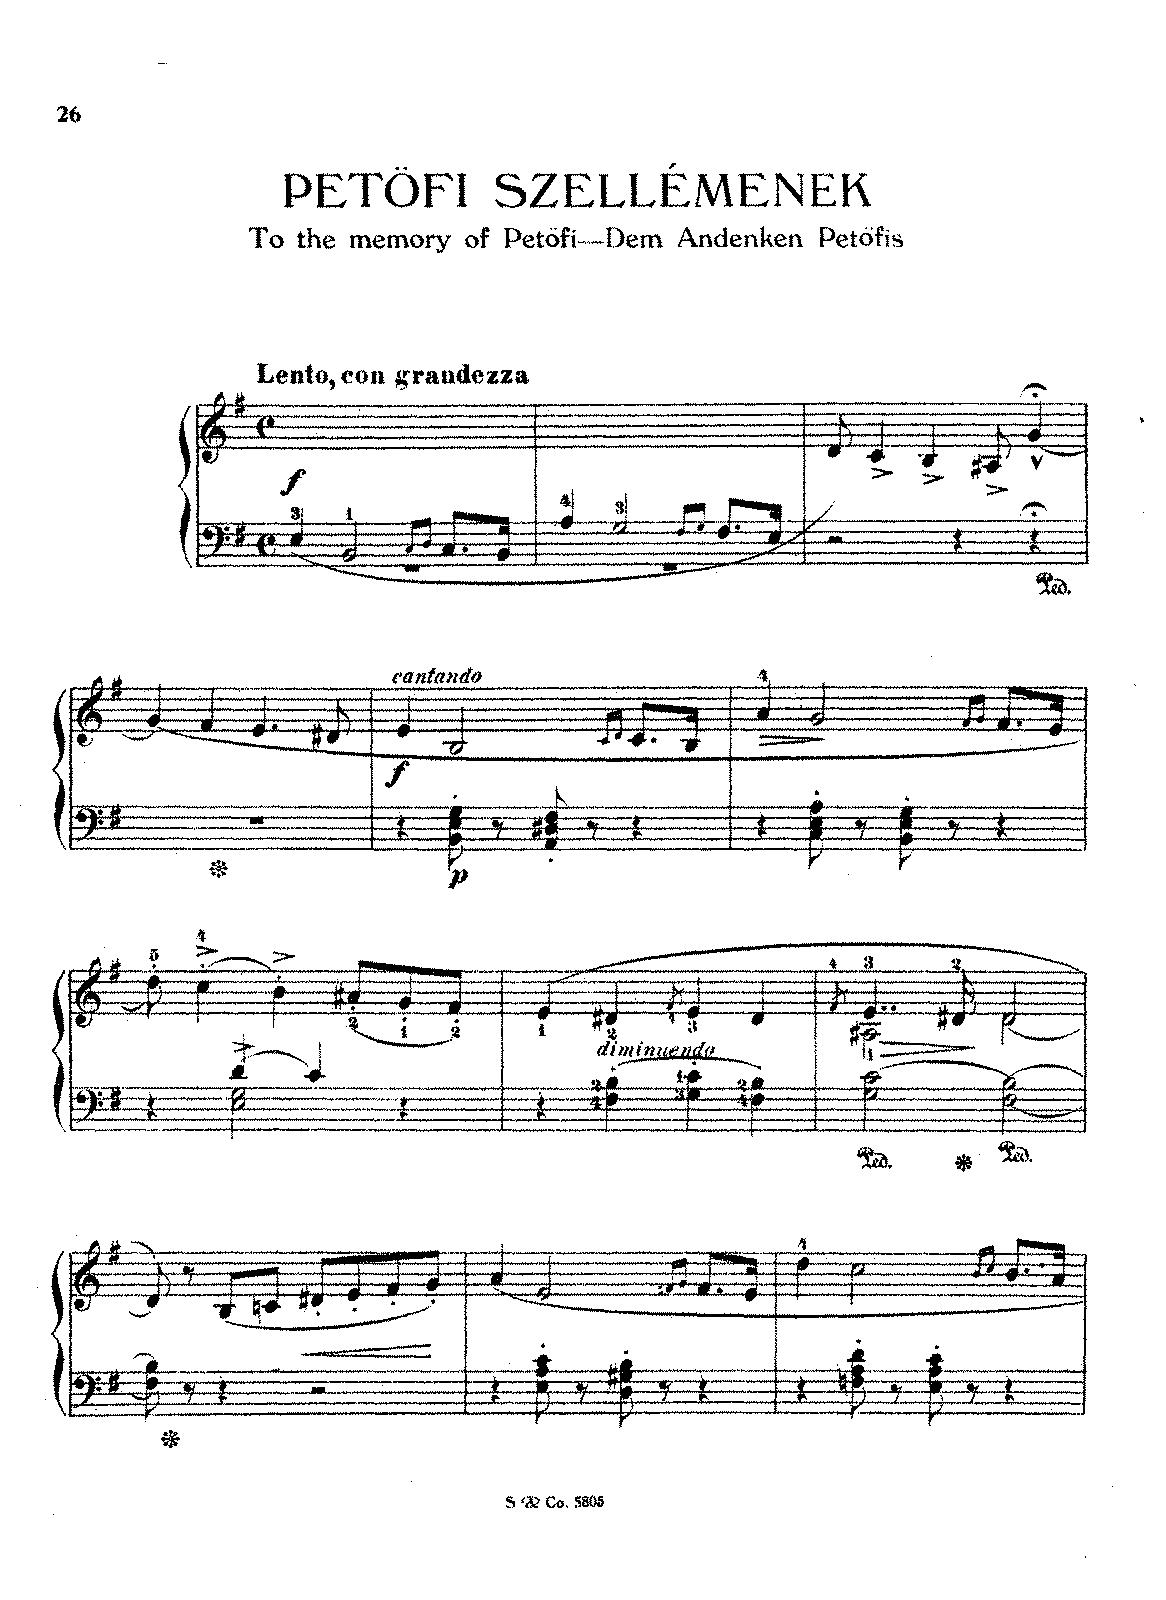 Bien-aimé Dem Andenken Petöfis, S.195 (Liszt, Franz) - IMSLP/Petrucci Music  VZ41